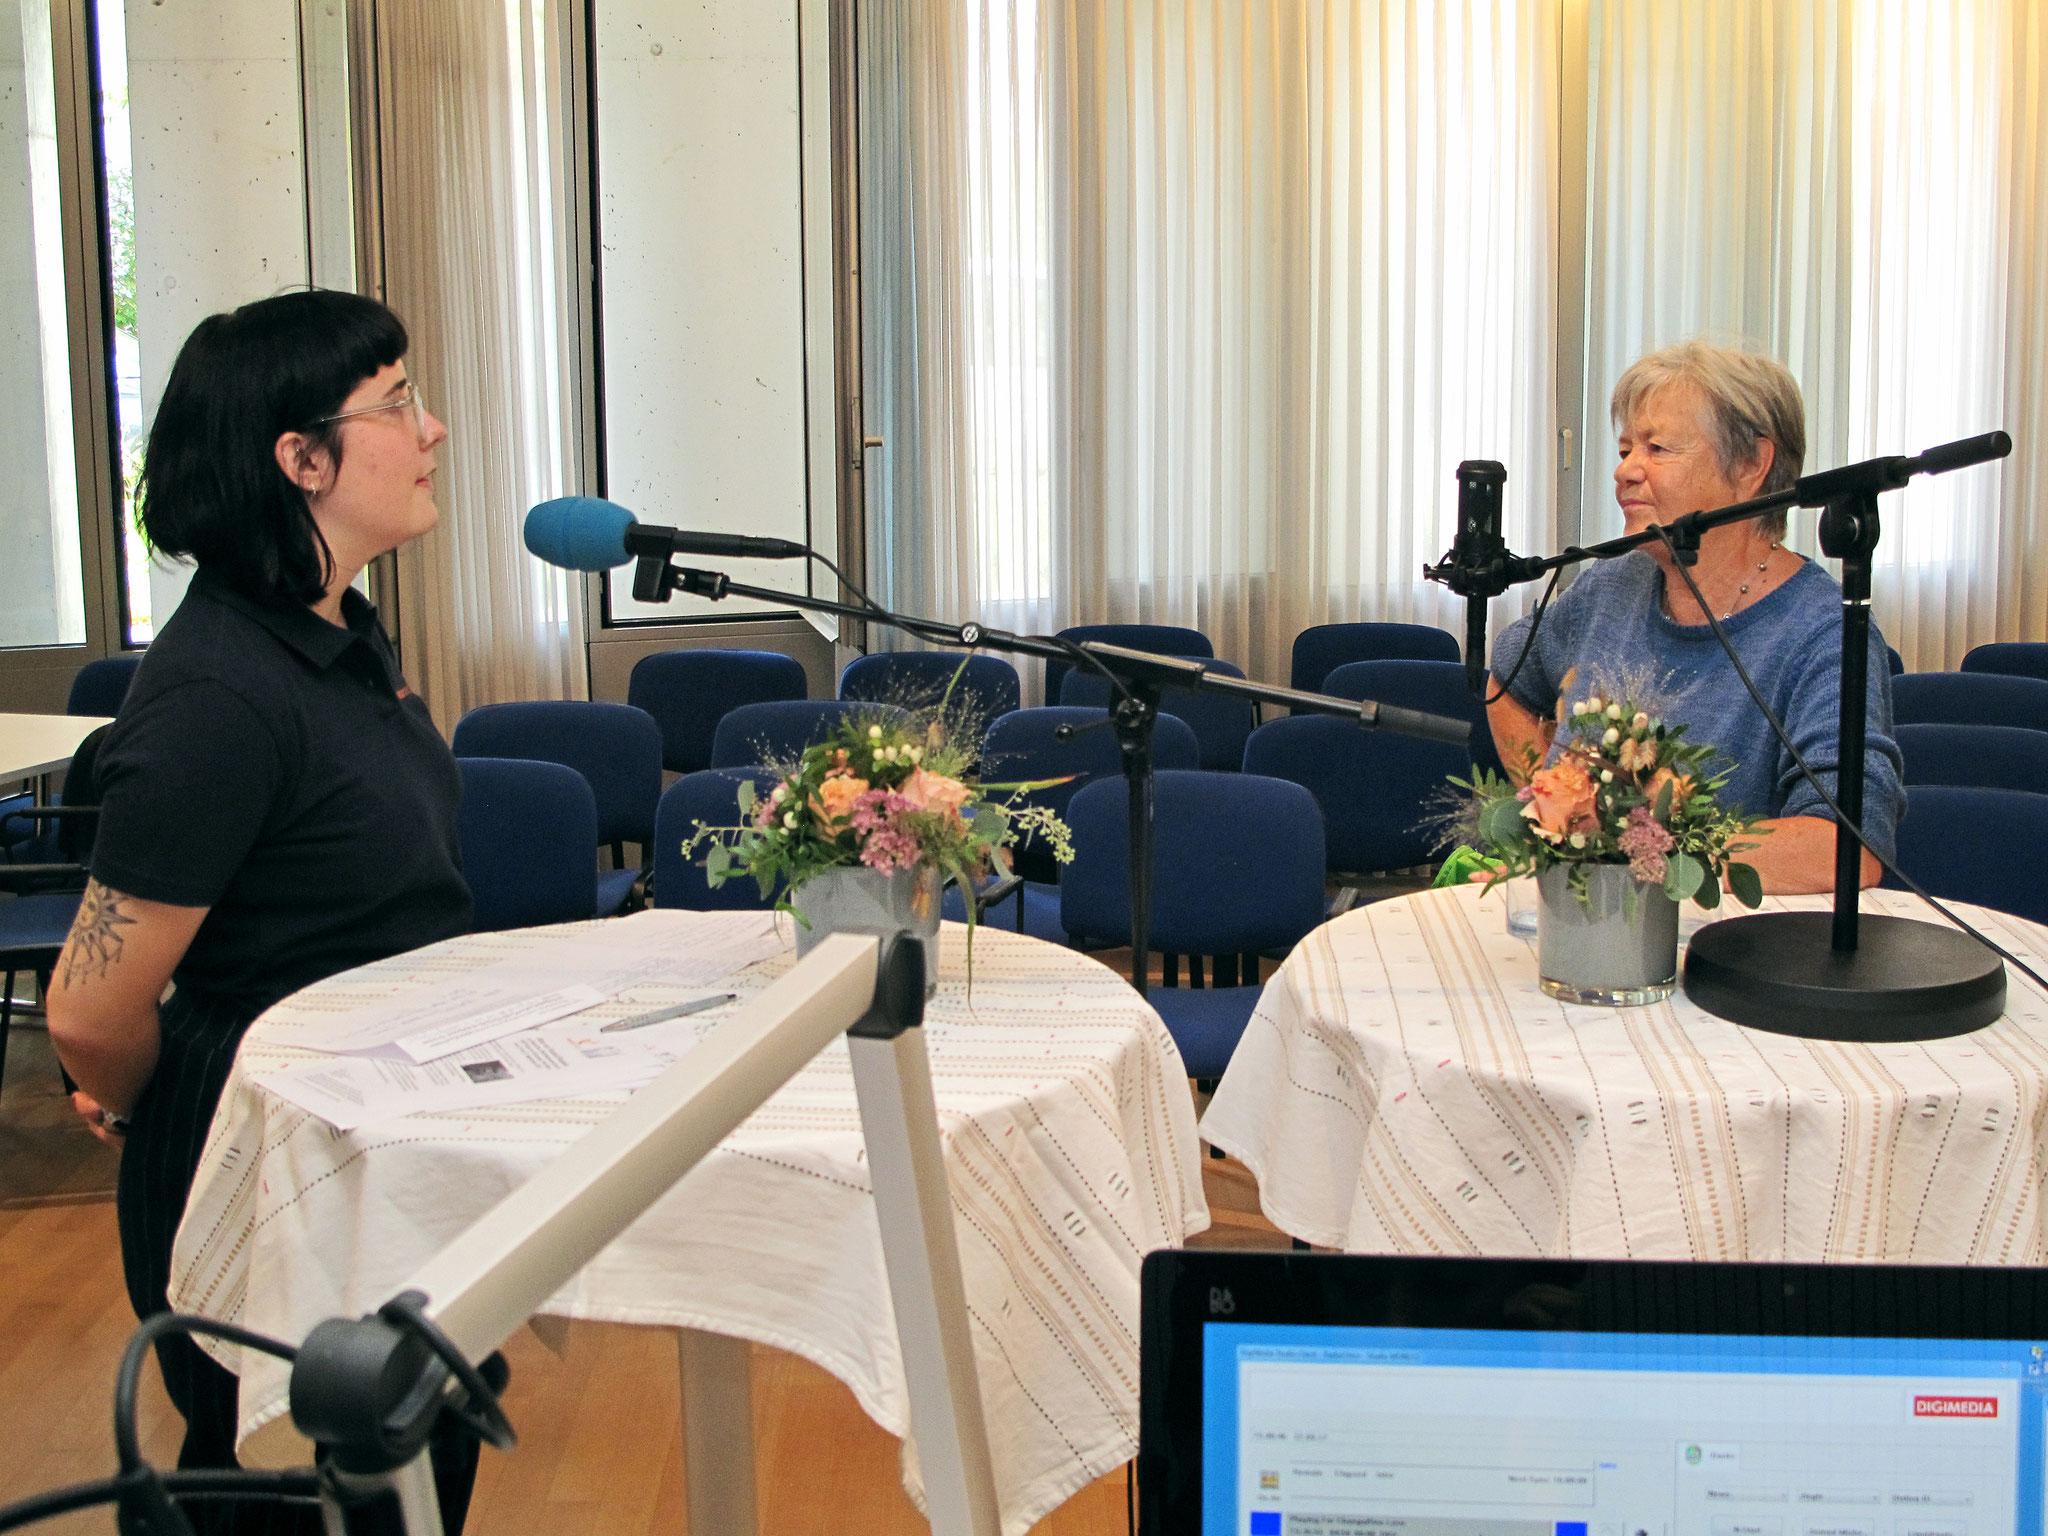 Katherina Merz erzählt Friedensgeschichten. Moderation: Céline